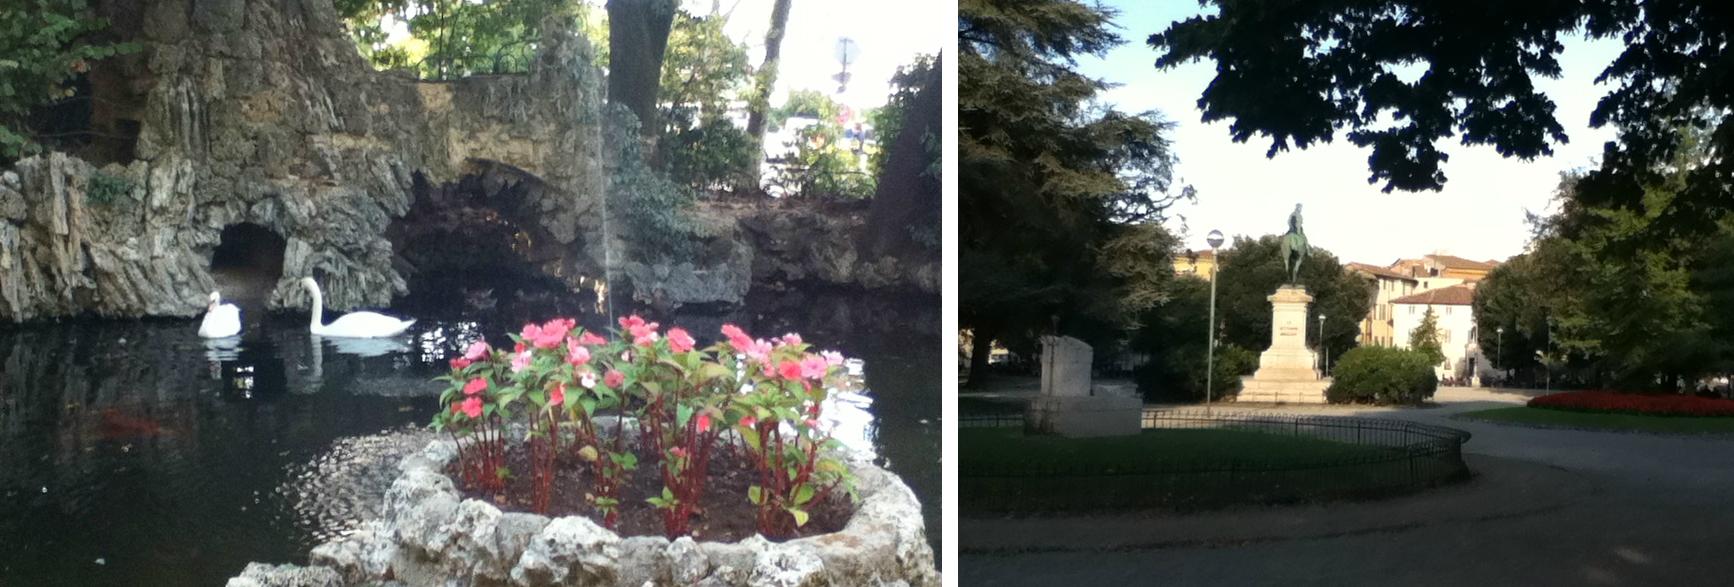 Italy - Siena - Giardini la Lizza - 1